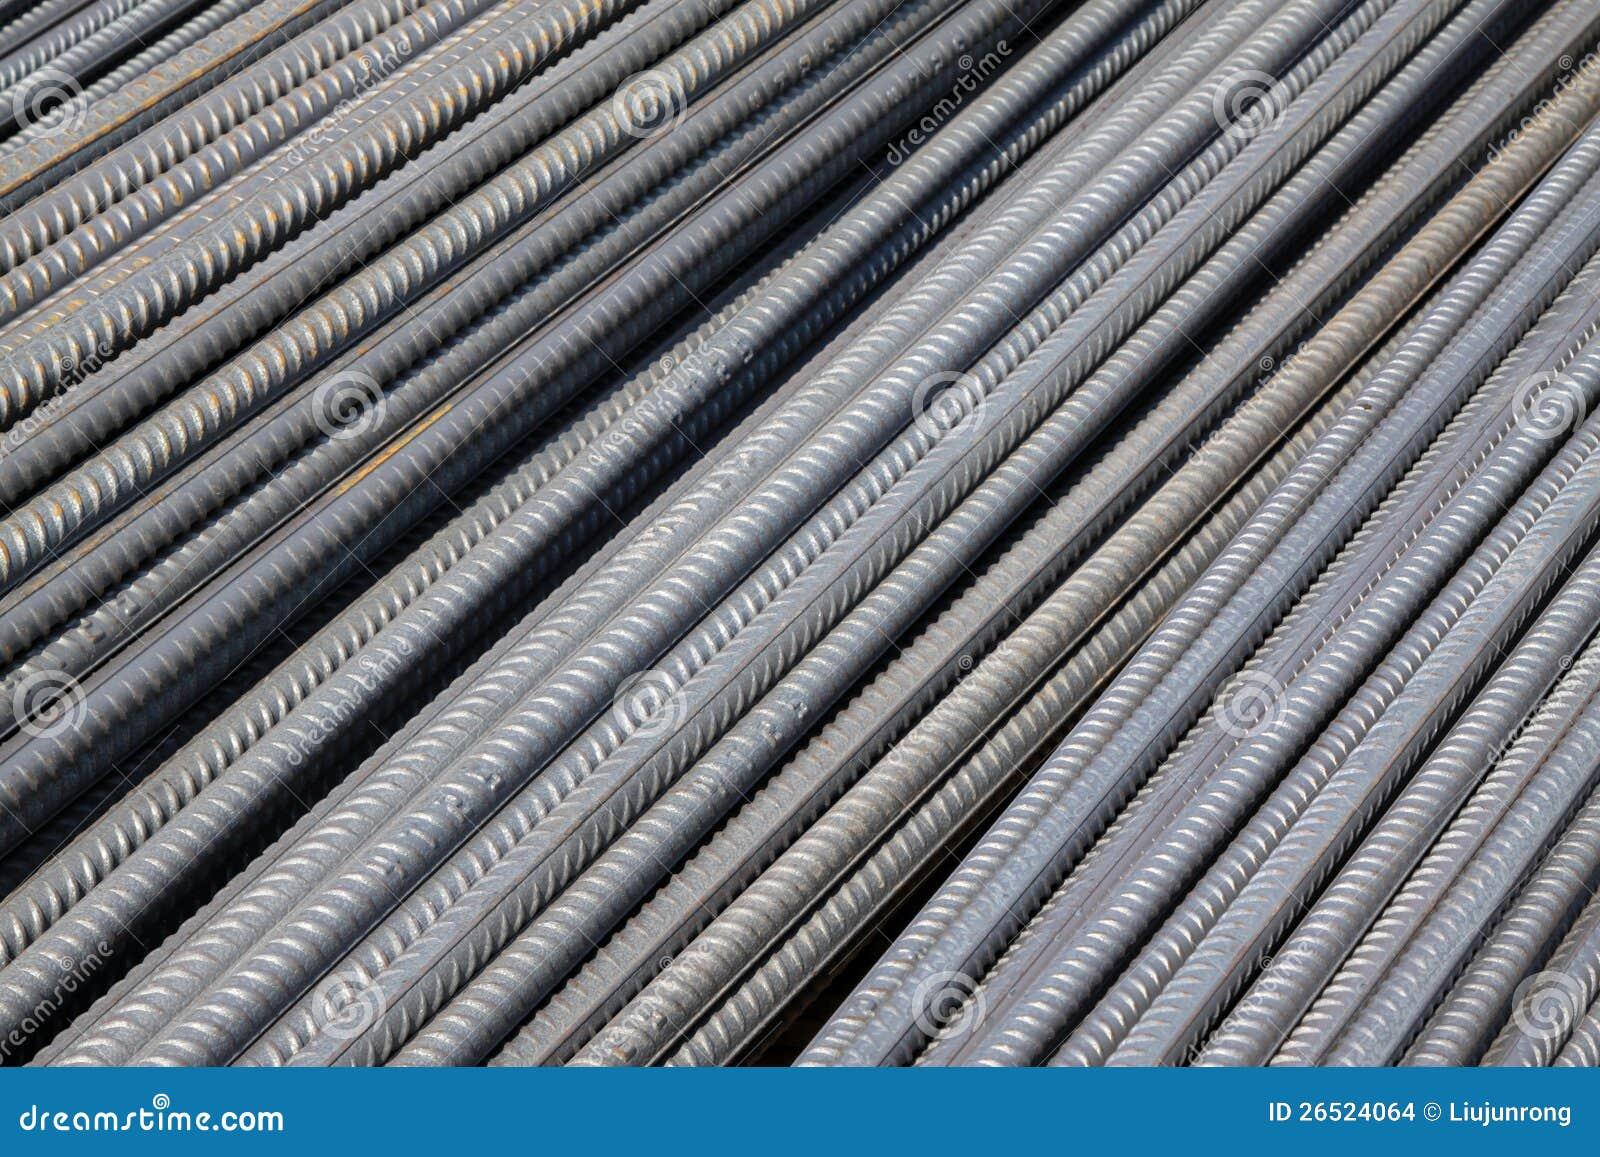 Bar Construction Materials : Steel bars construction materials stock images image